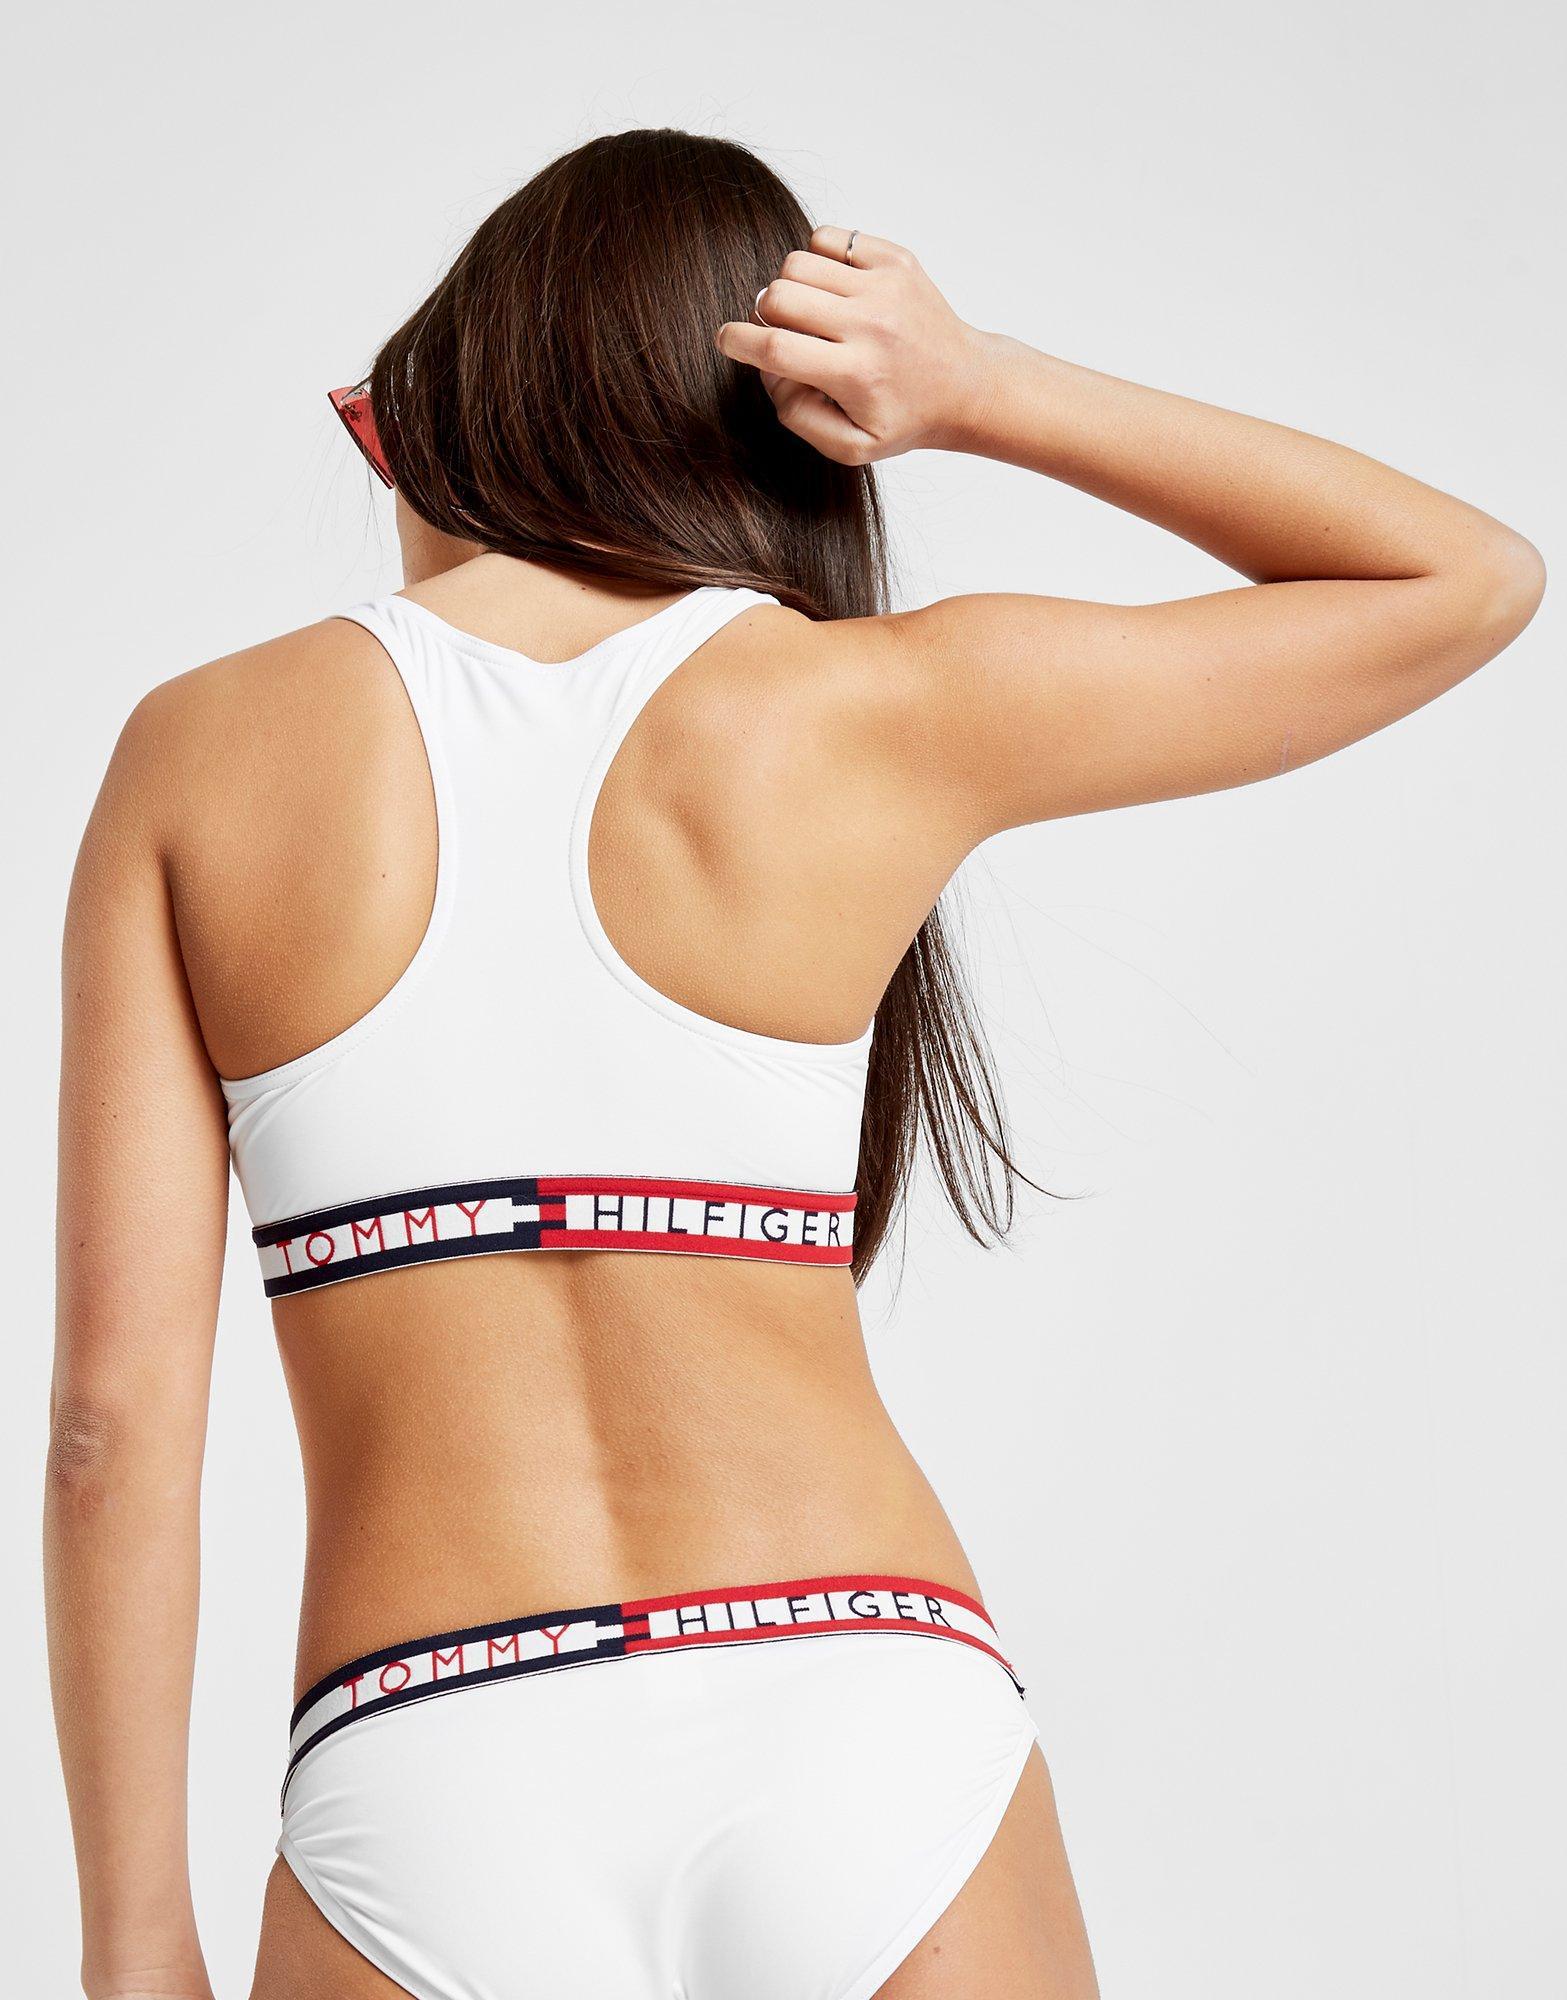 5781440ab7 Tommy Hilfiger Racerback Bikini Top in White - Lyst